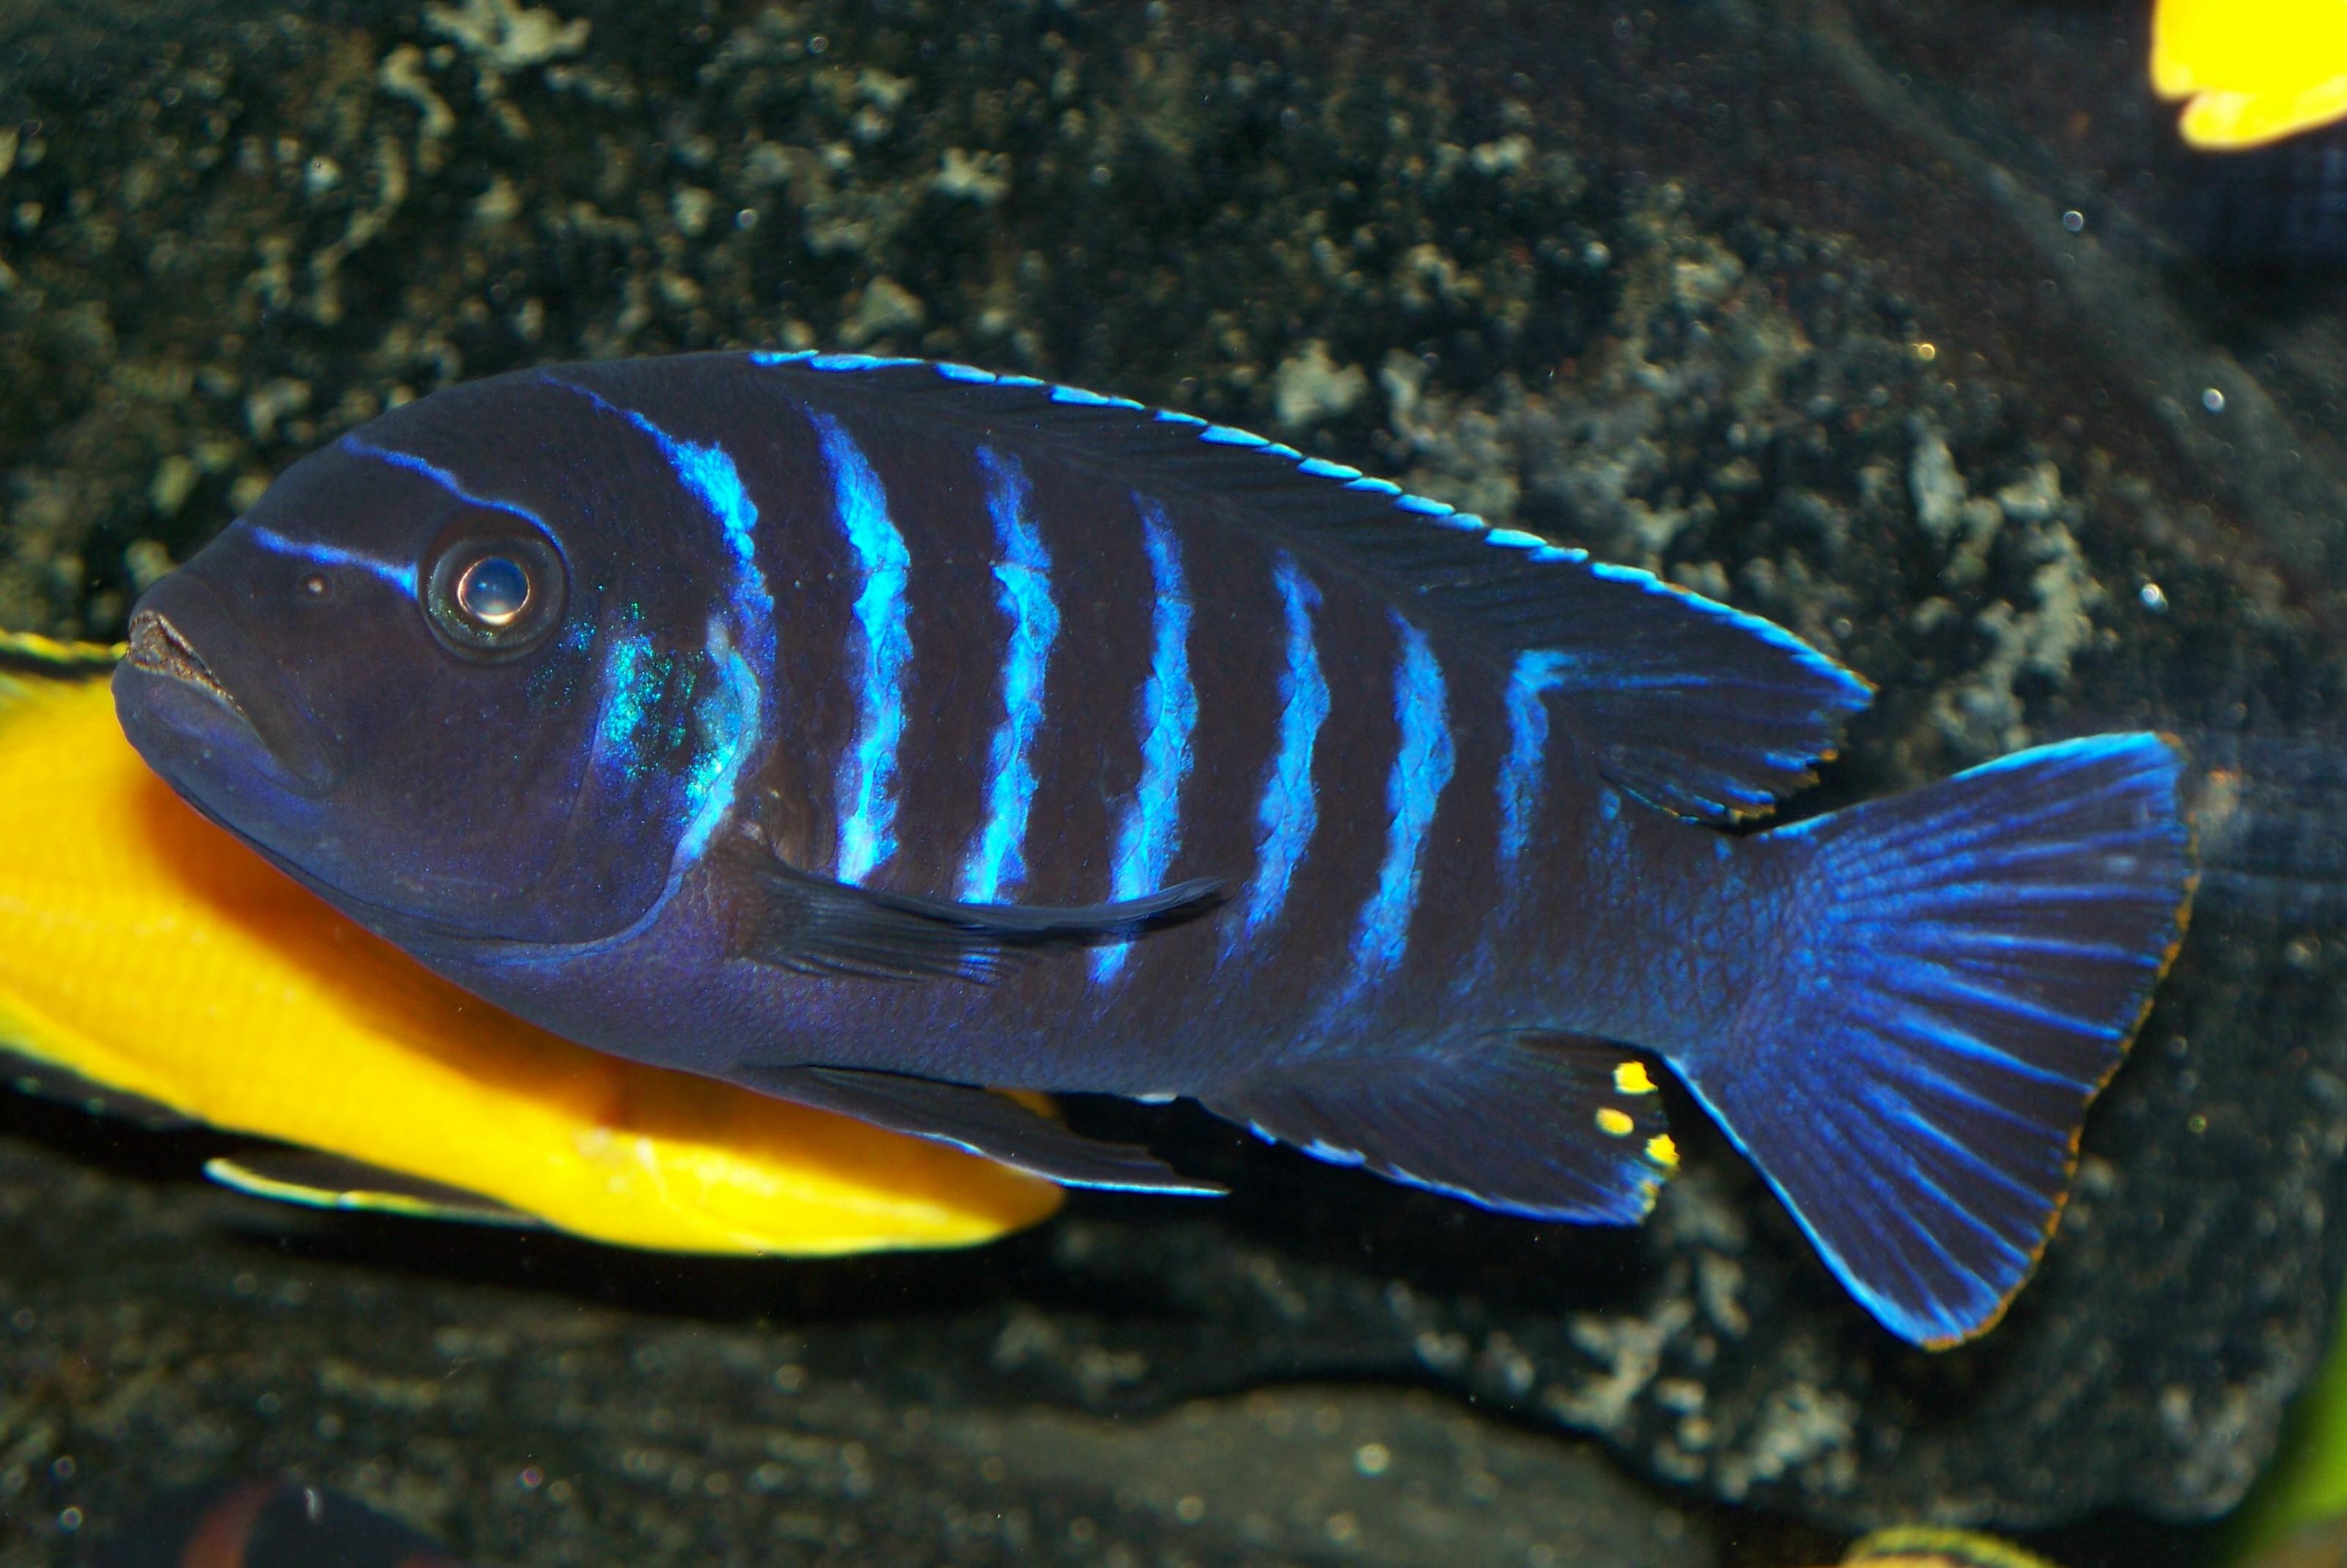 Blue Dolphin Cichlid Images & Pictures - Findpik